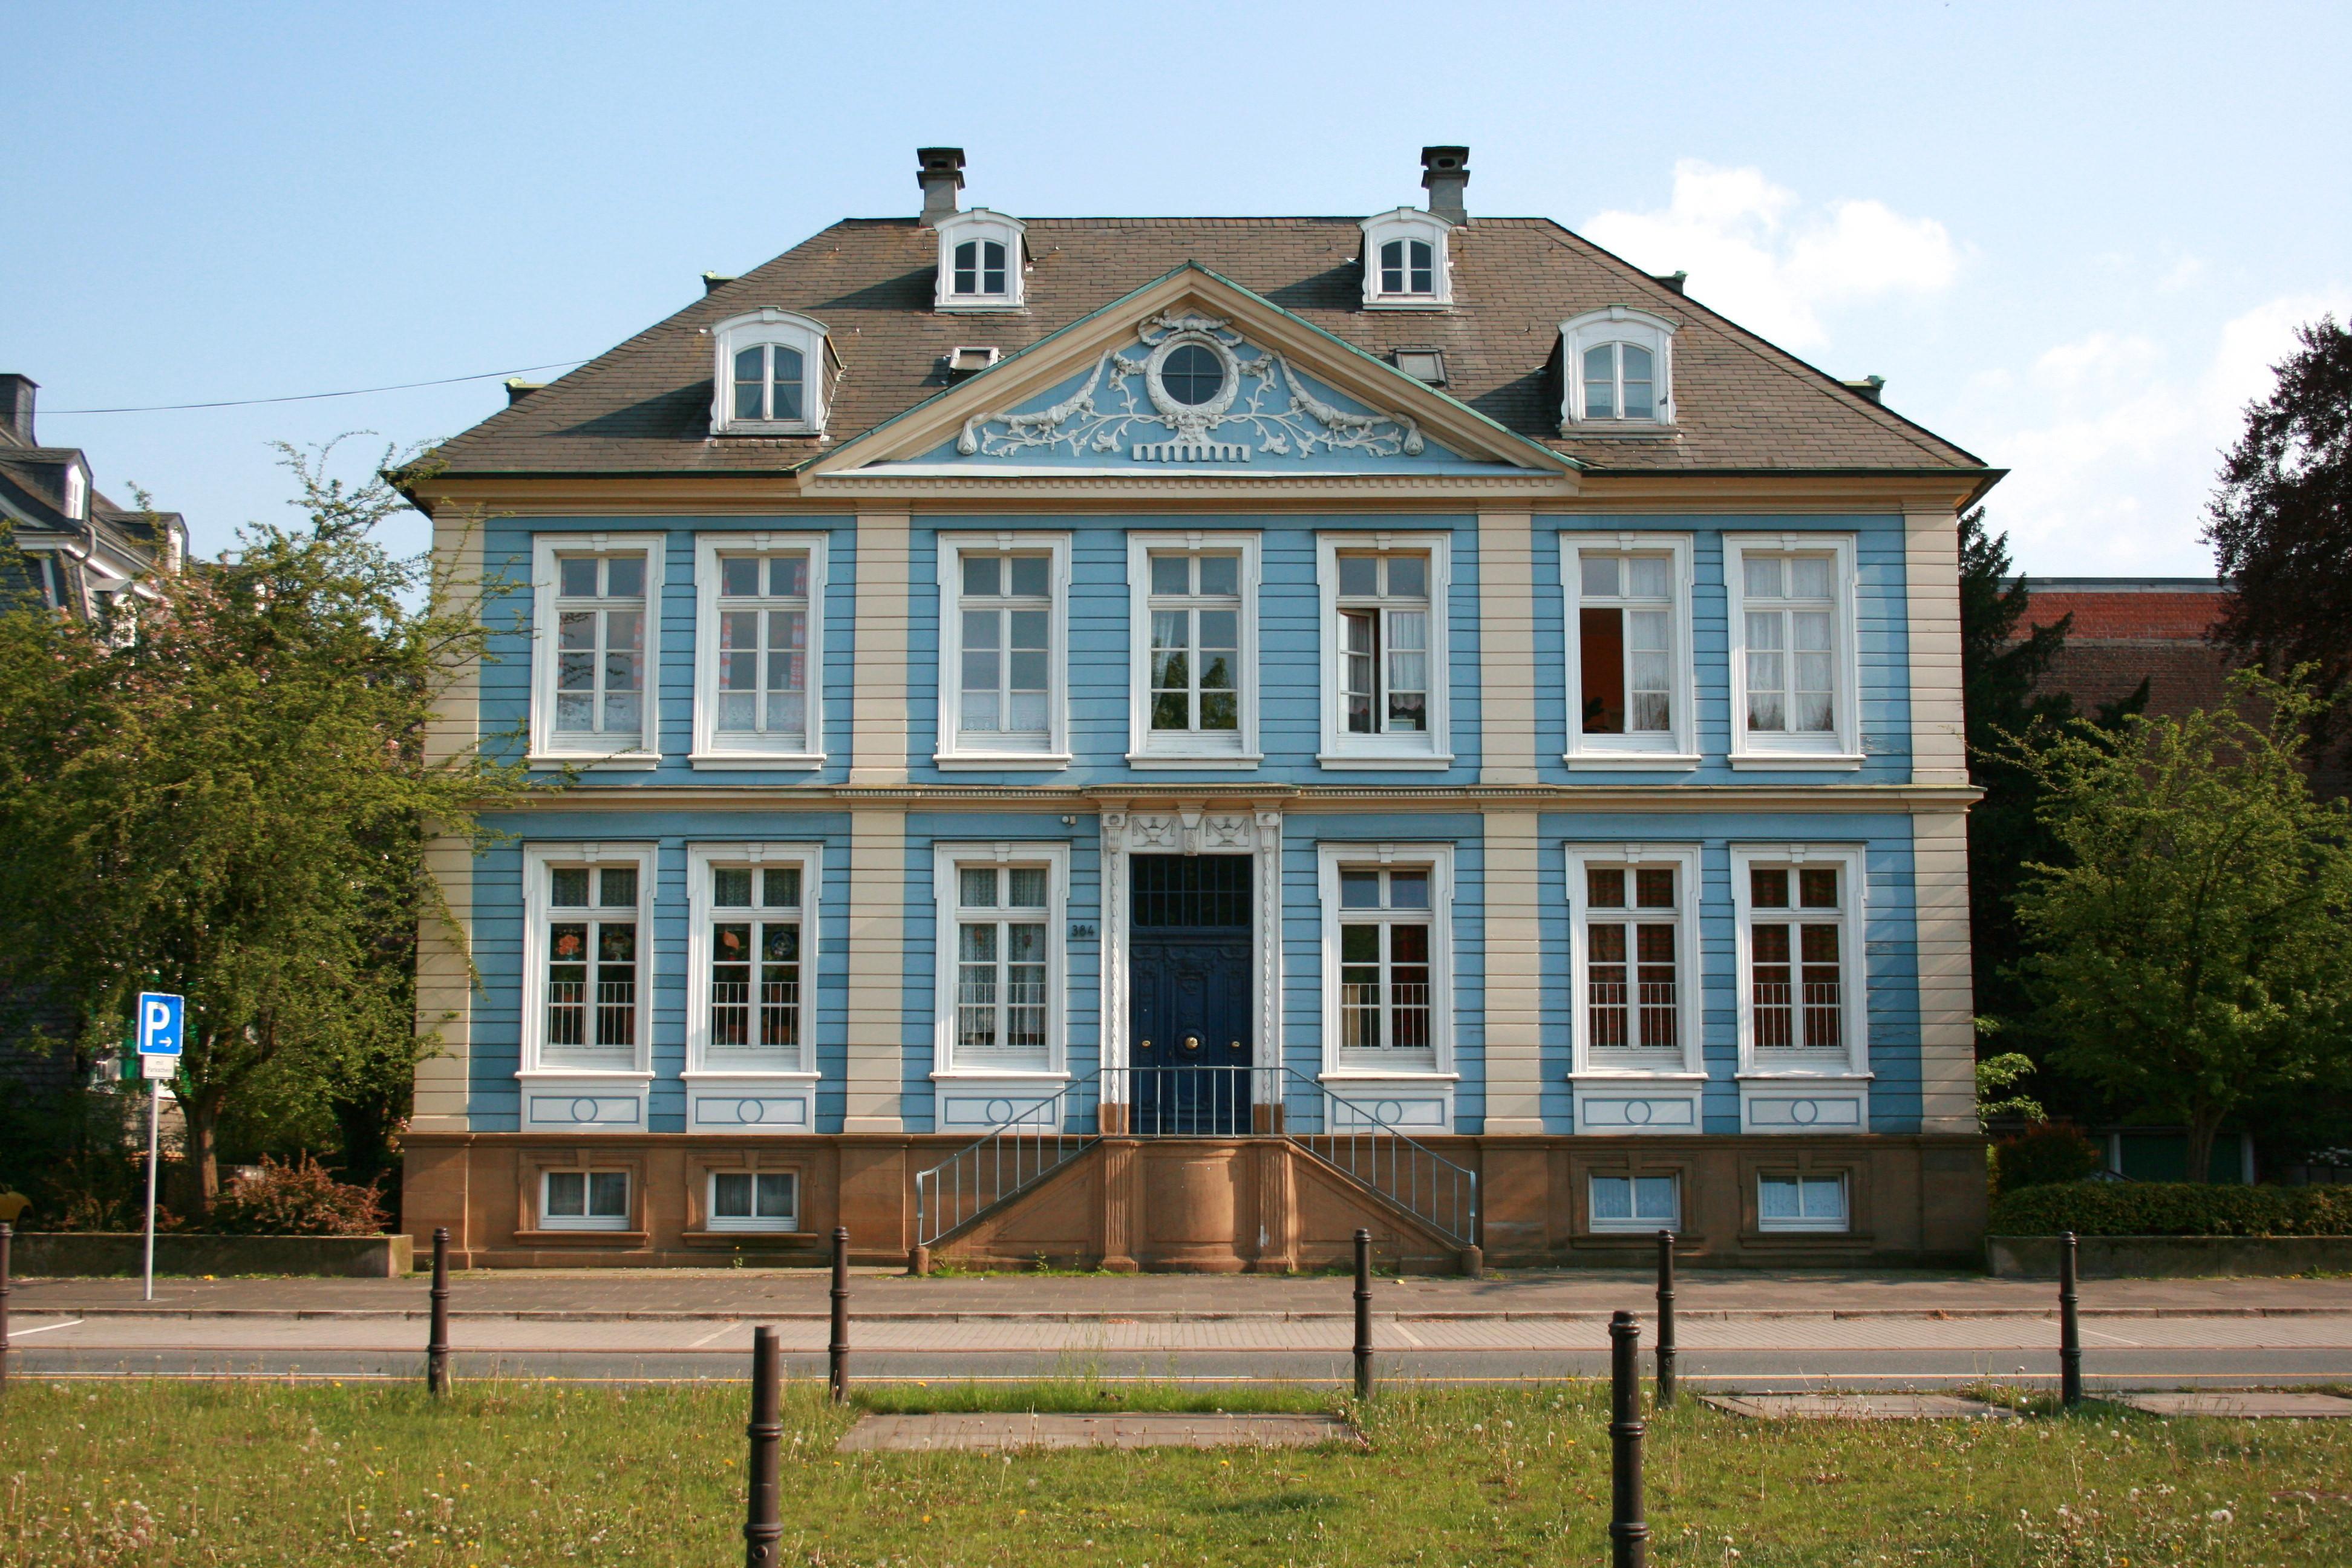 Datei:Wuppertal - Haus Bartels 01 ies.jpg – Wikipedia